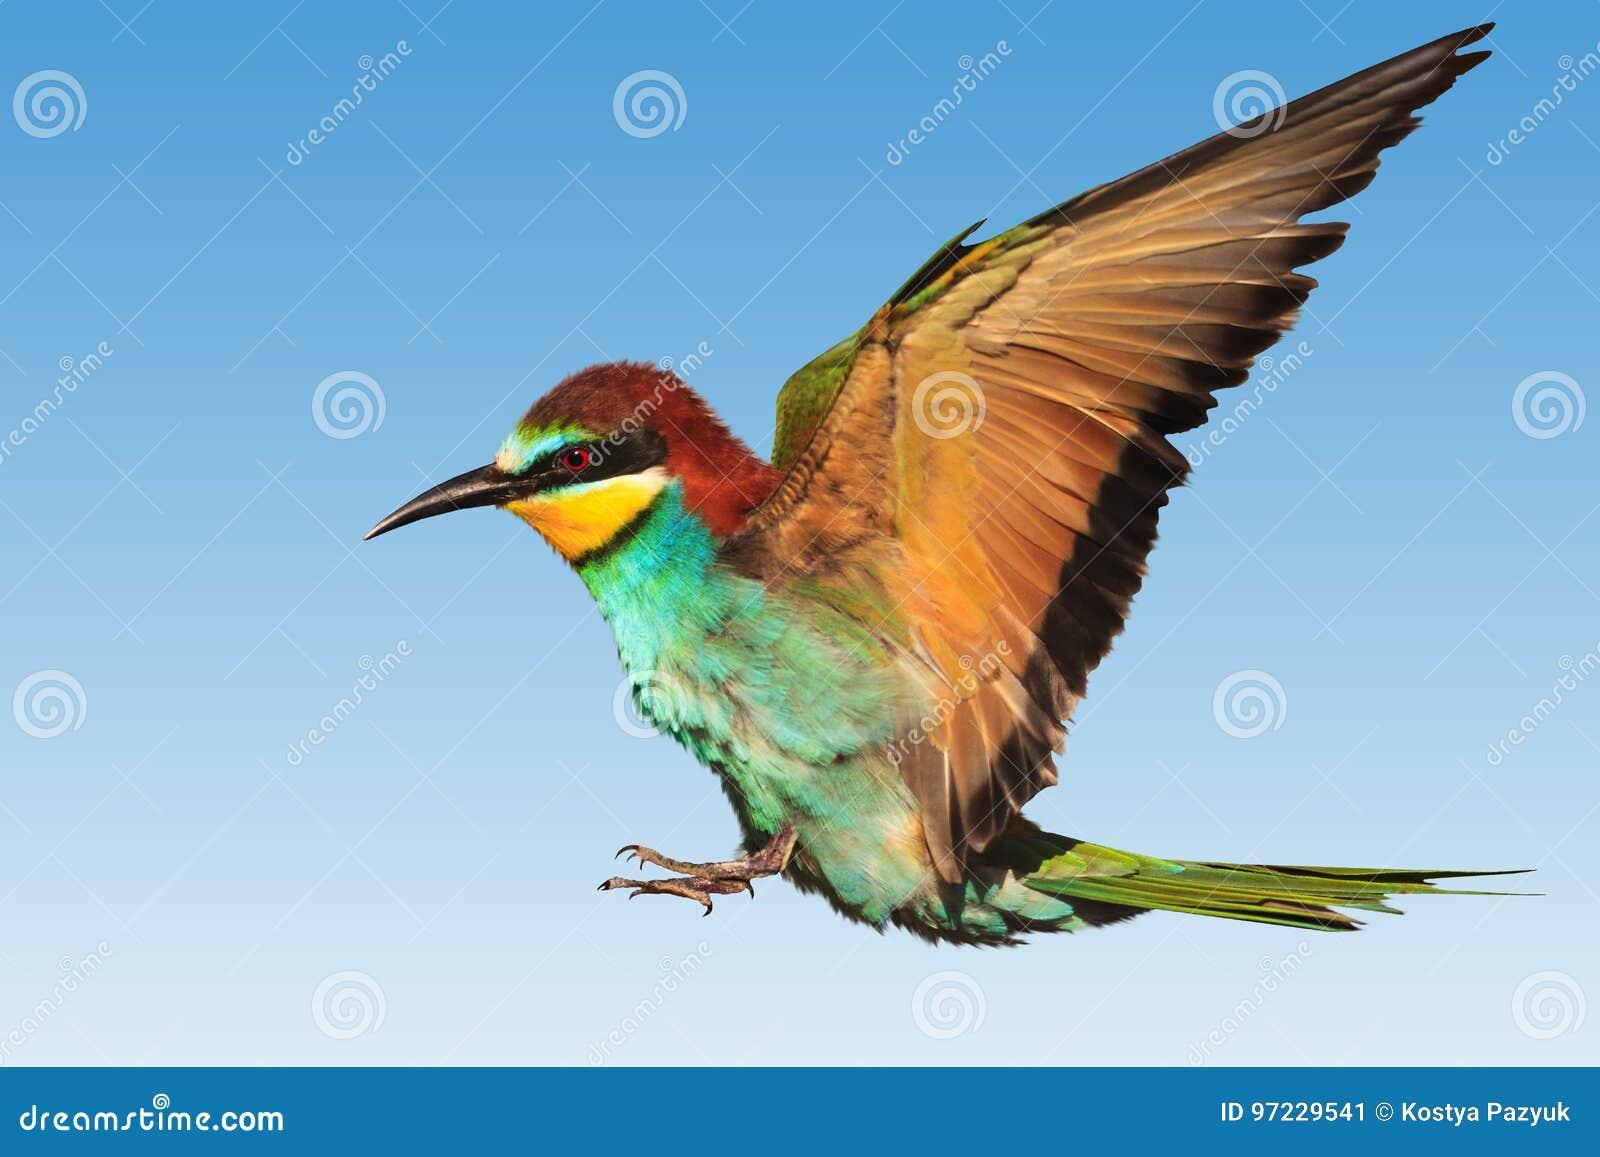 Paradise Bird In Flight Stock Image Image Of Energy 97229541